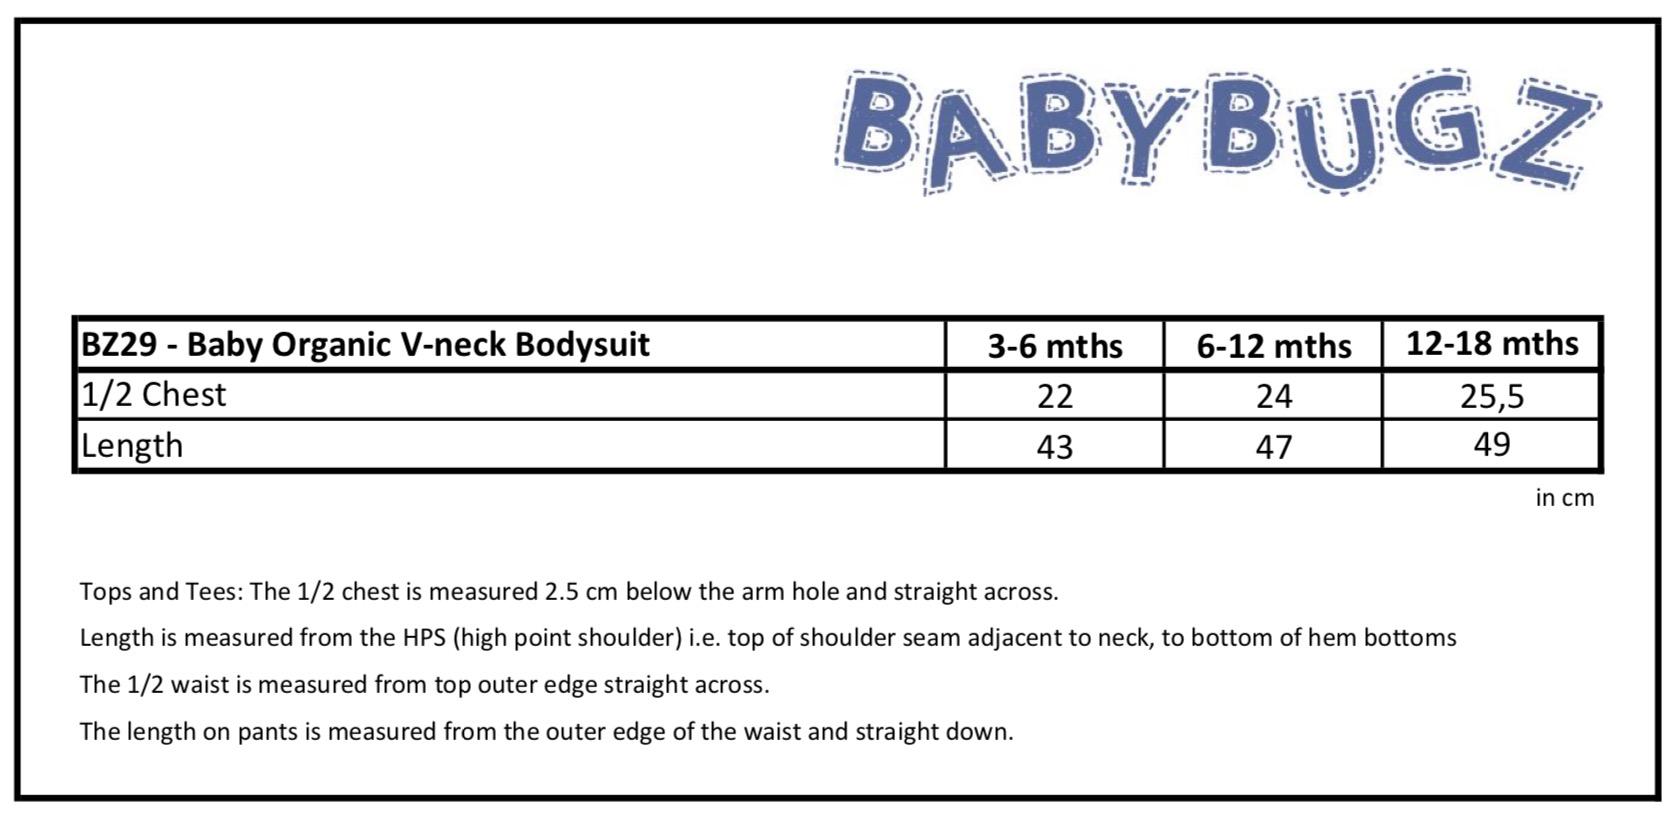 Größentabelle für BabyBugz: Baby Organic V-neck Bodysuit BZ29